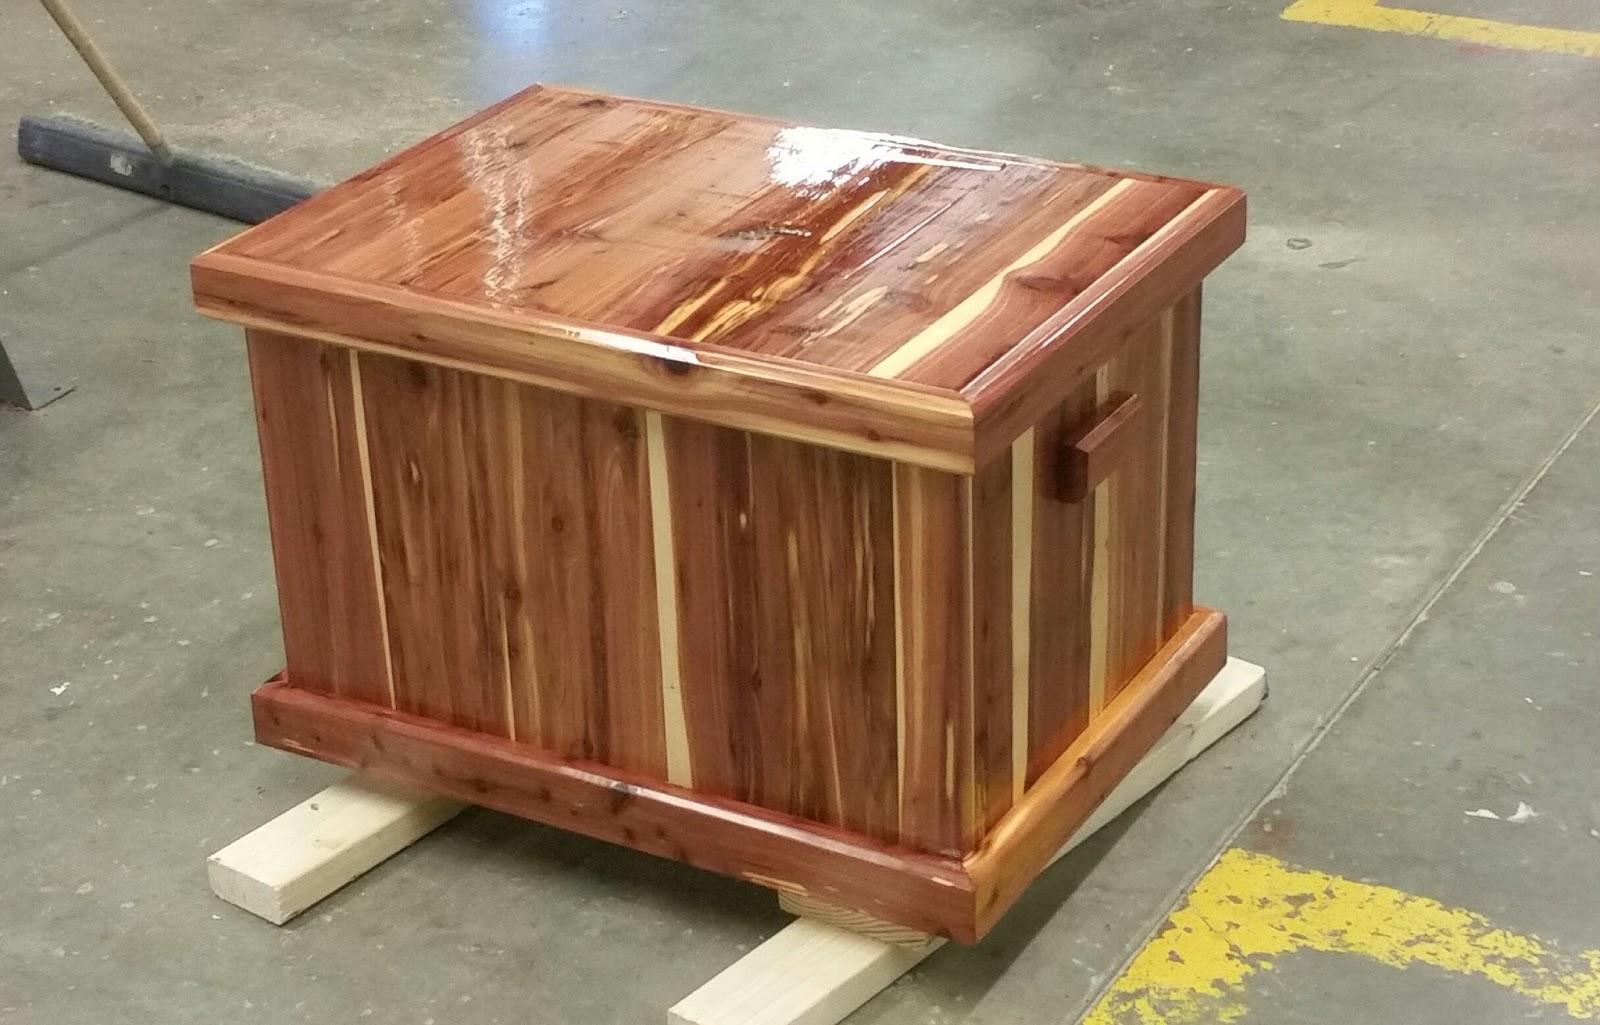 Handyman How 2: Making a Cedar Chest